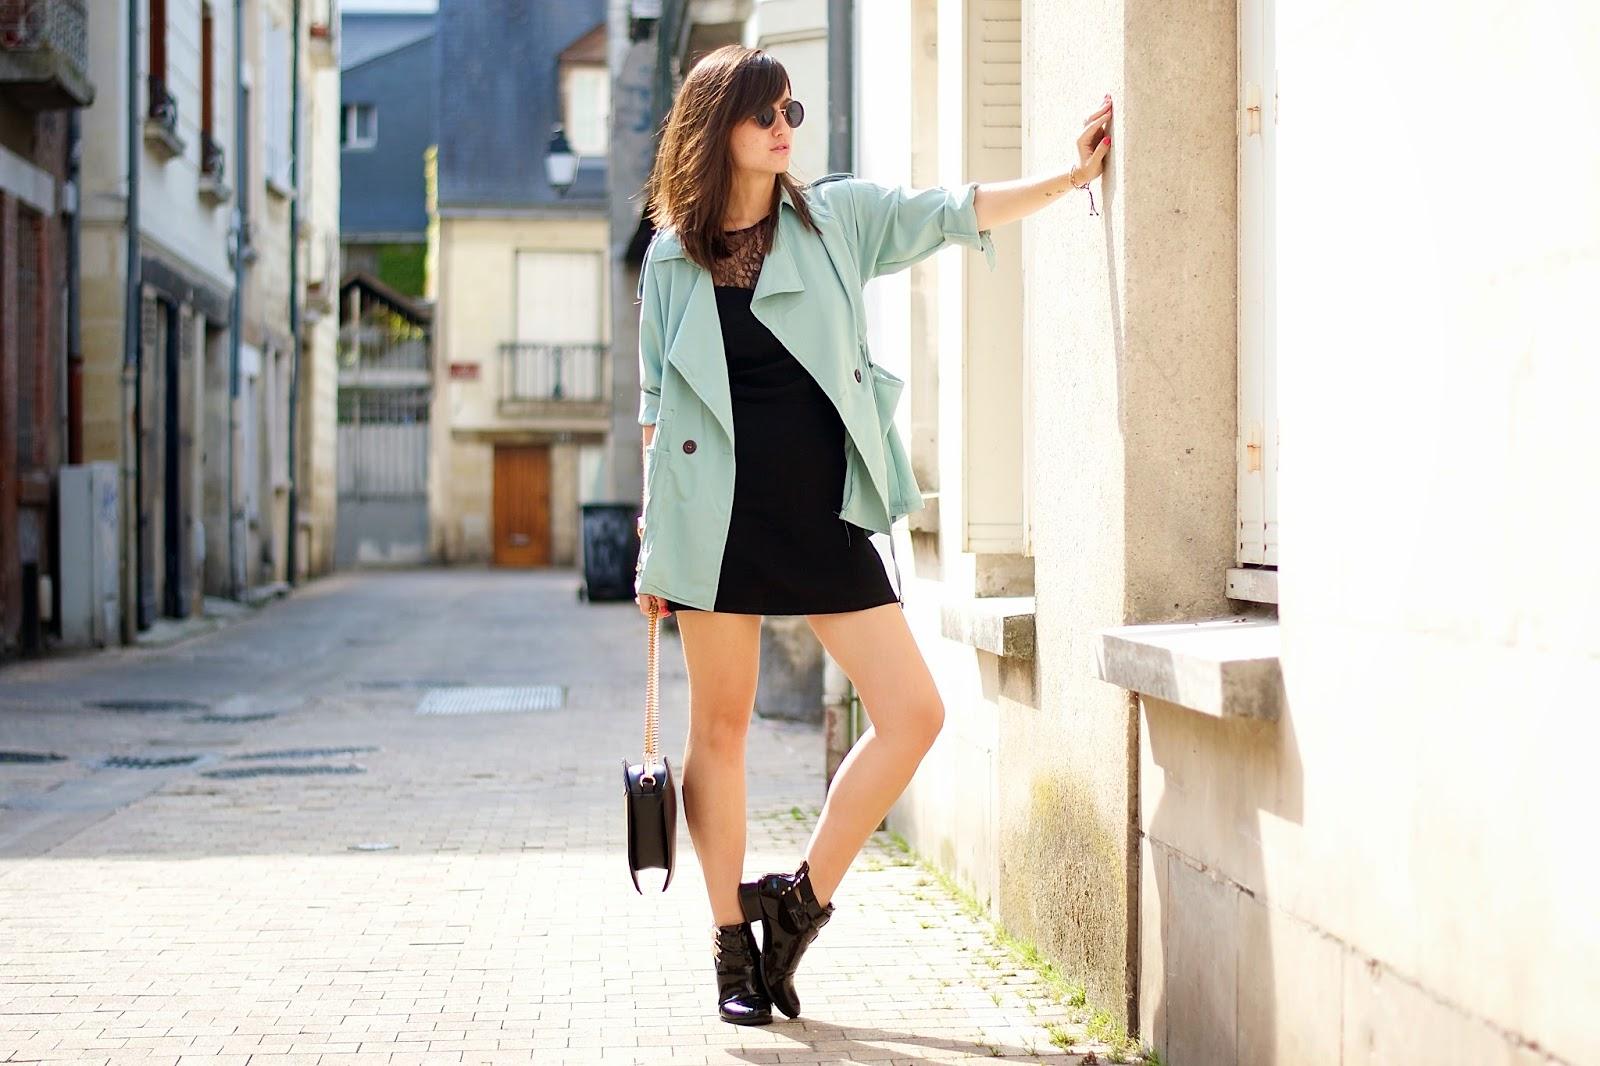 Paris Fashion blogger